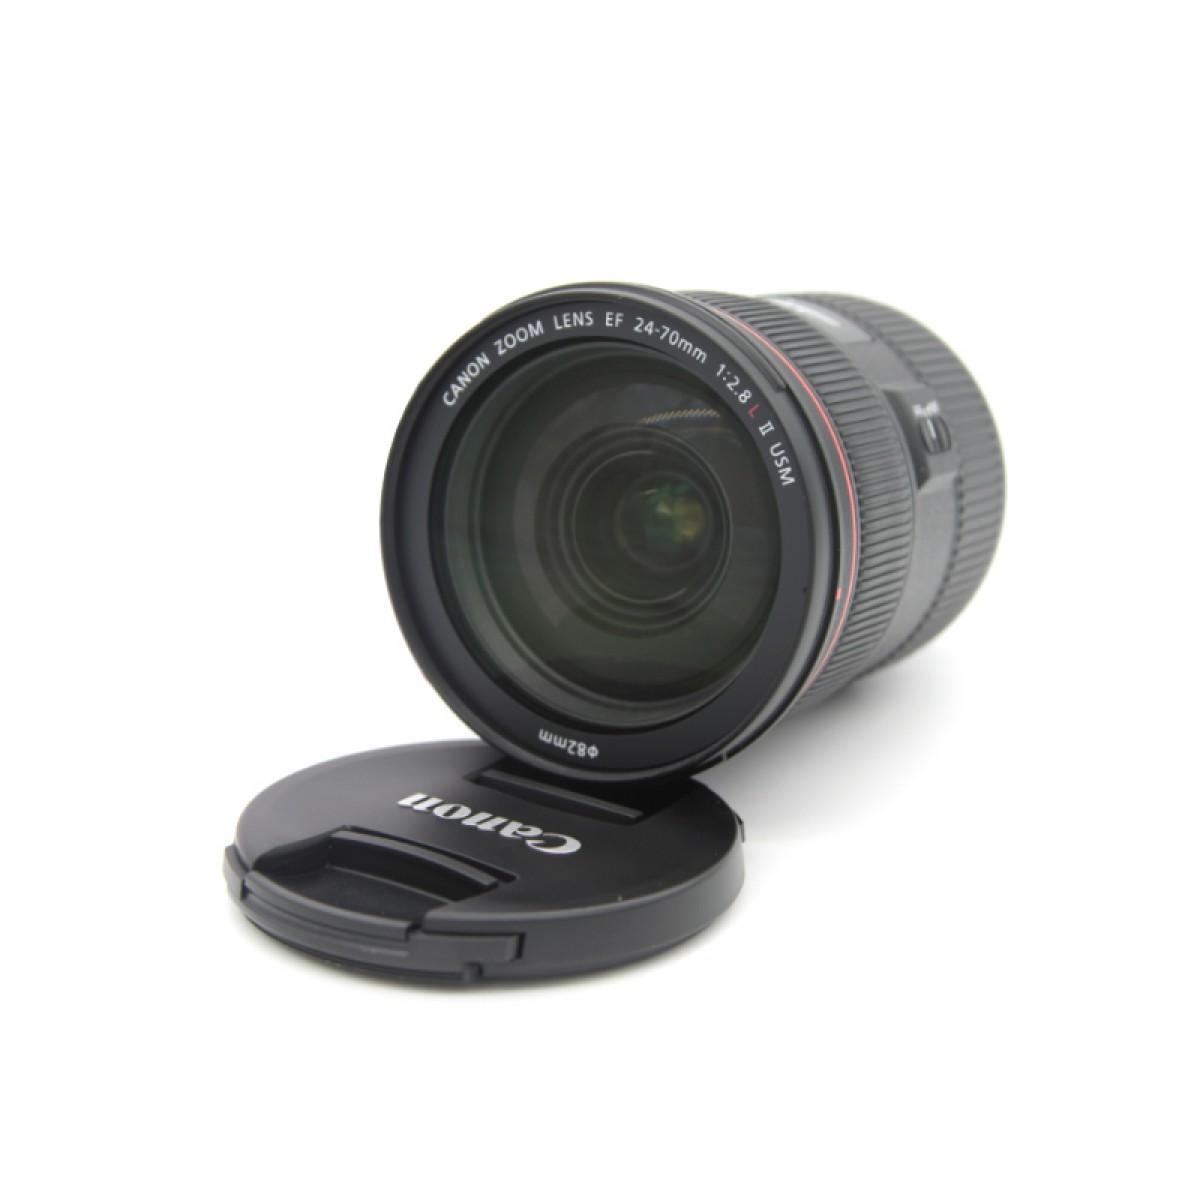 [旗舰店]Canon/佳能 EF 24-70mm f/2.8L II USM 标准变焦单反镜头